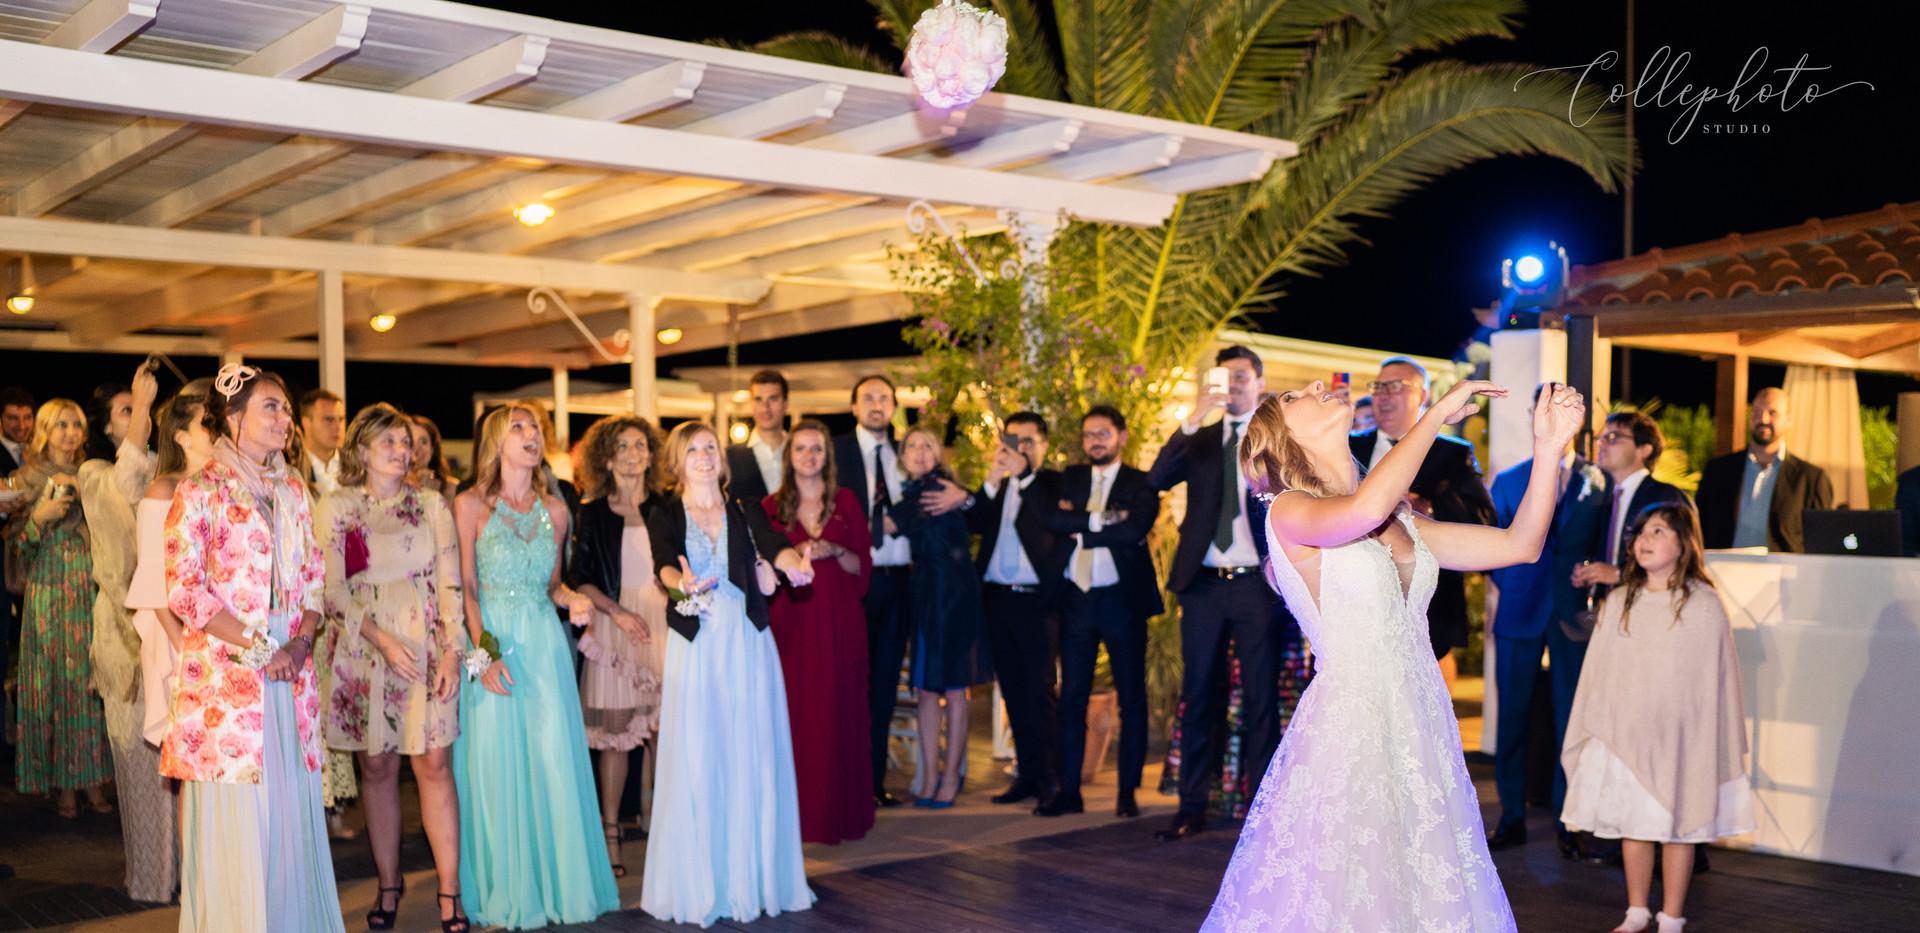 weddingfrancomare275.jpg